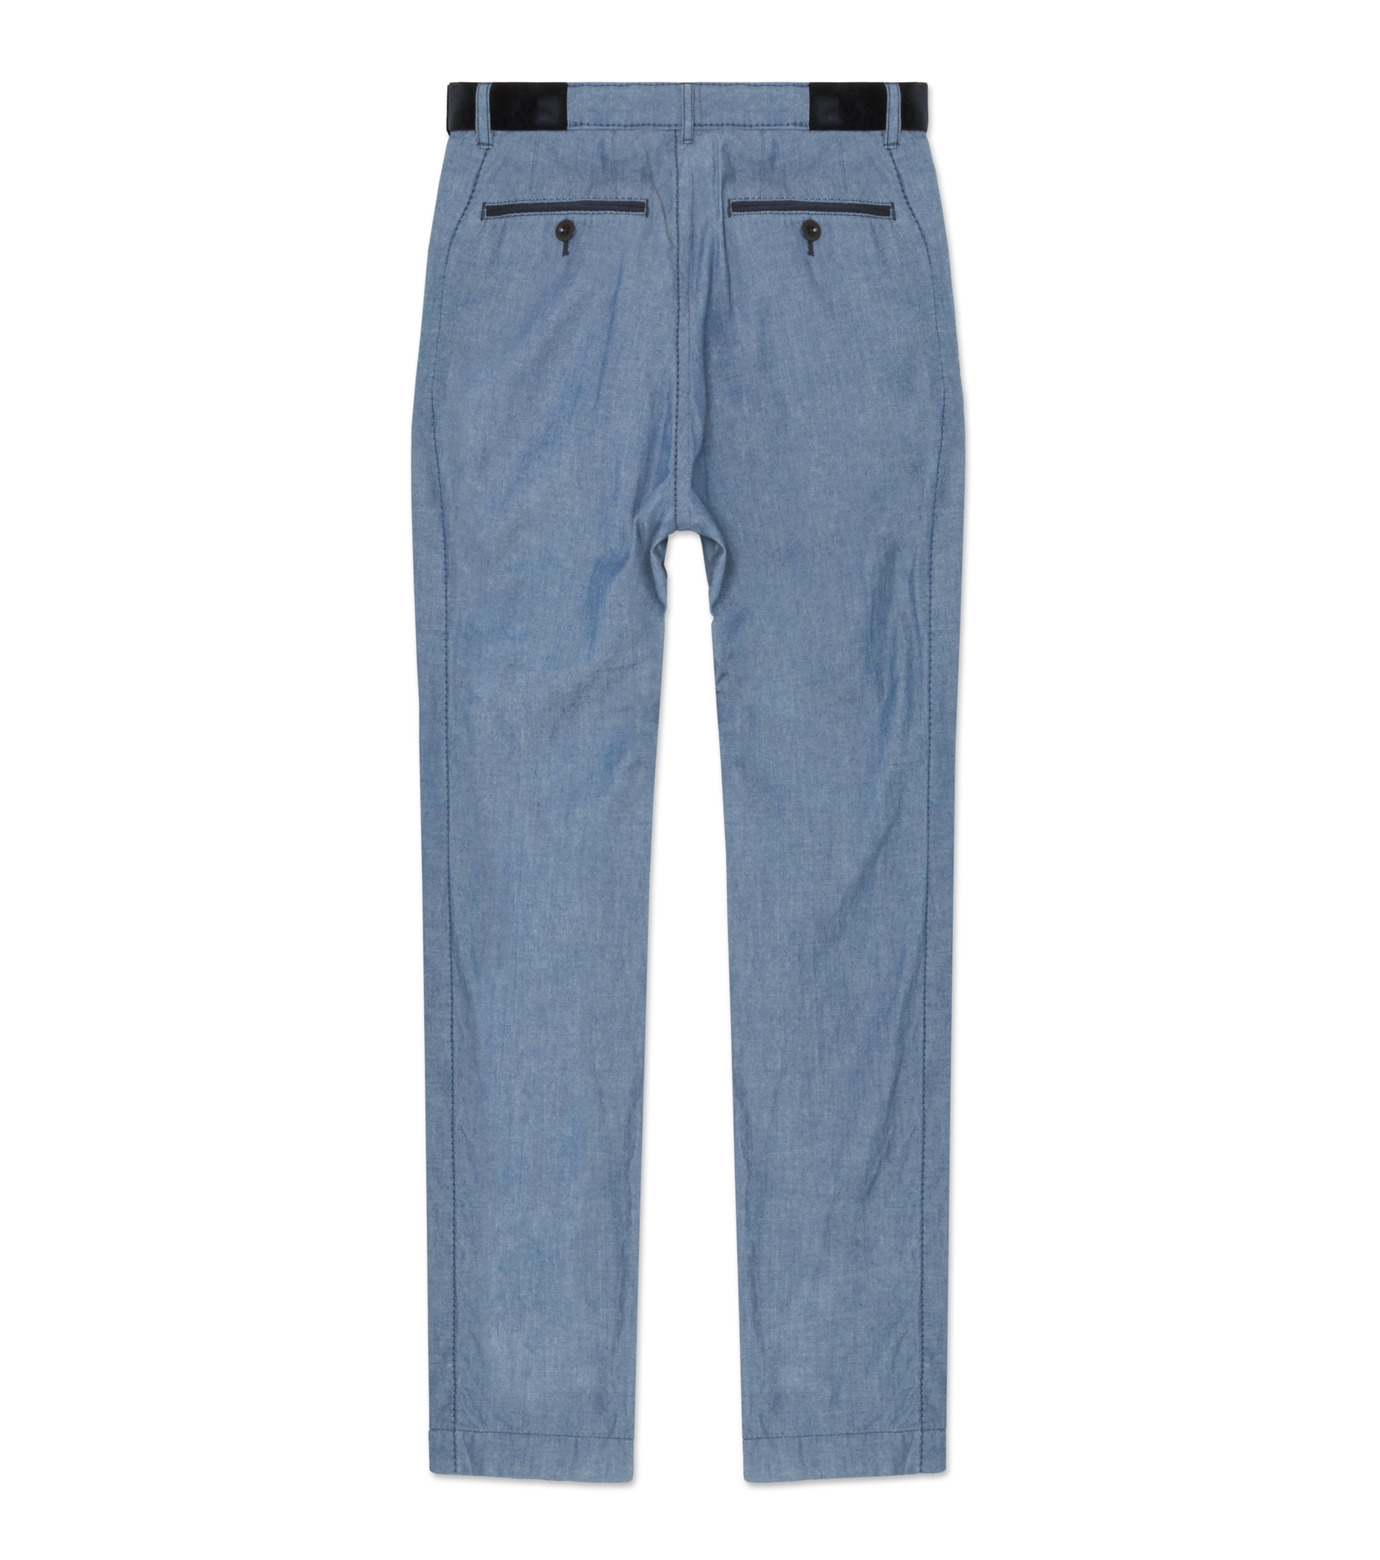 Sacai(サカイ)のDenim Pants-BLUE-16-01091M-92 拡大詳細画像2